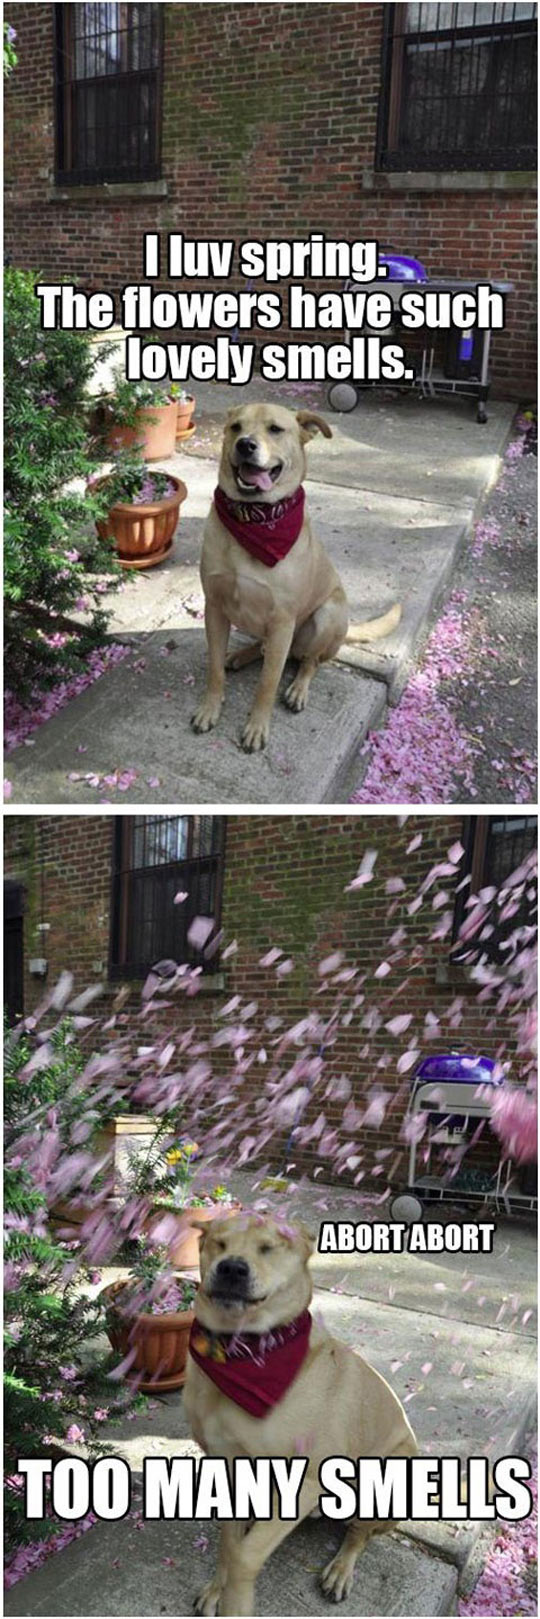 funny-dog-flowers-springs-smells